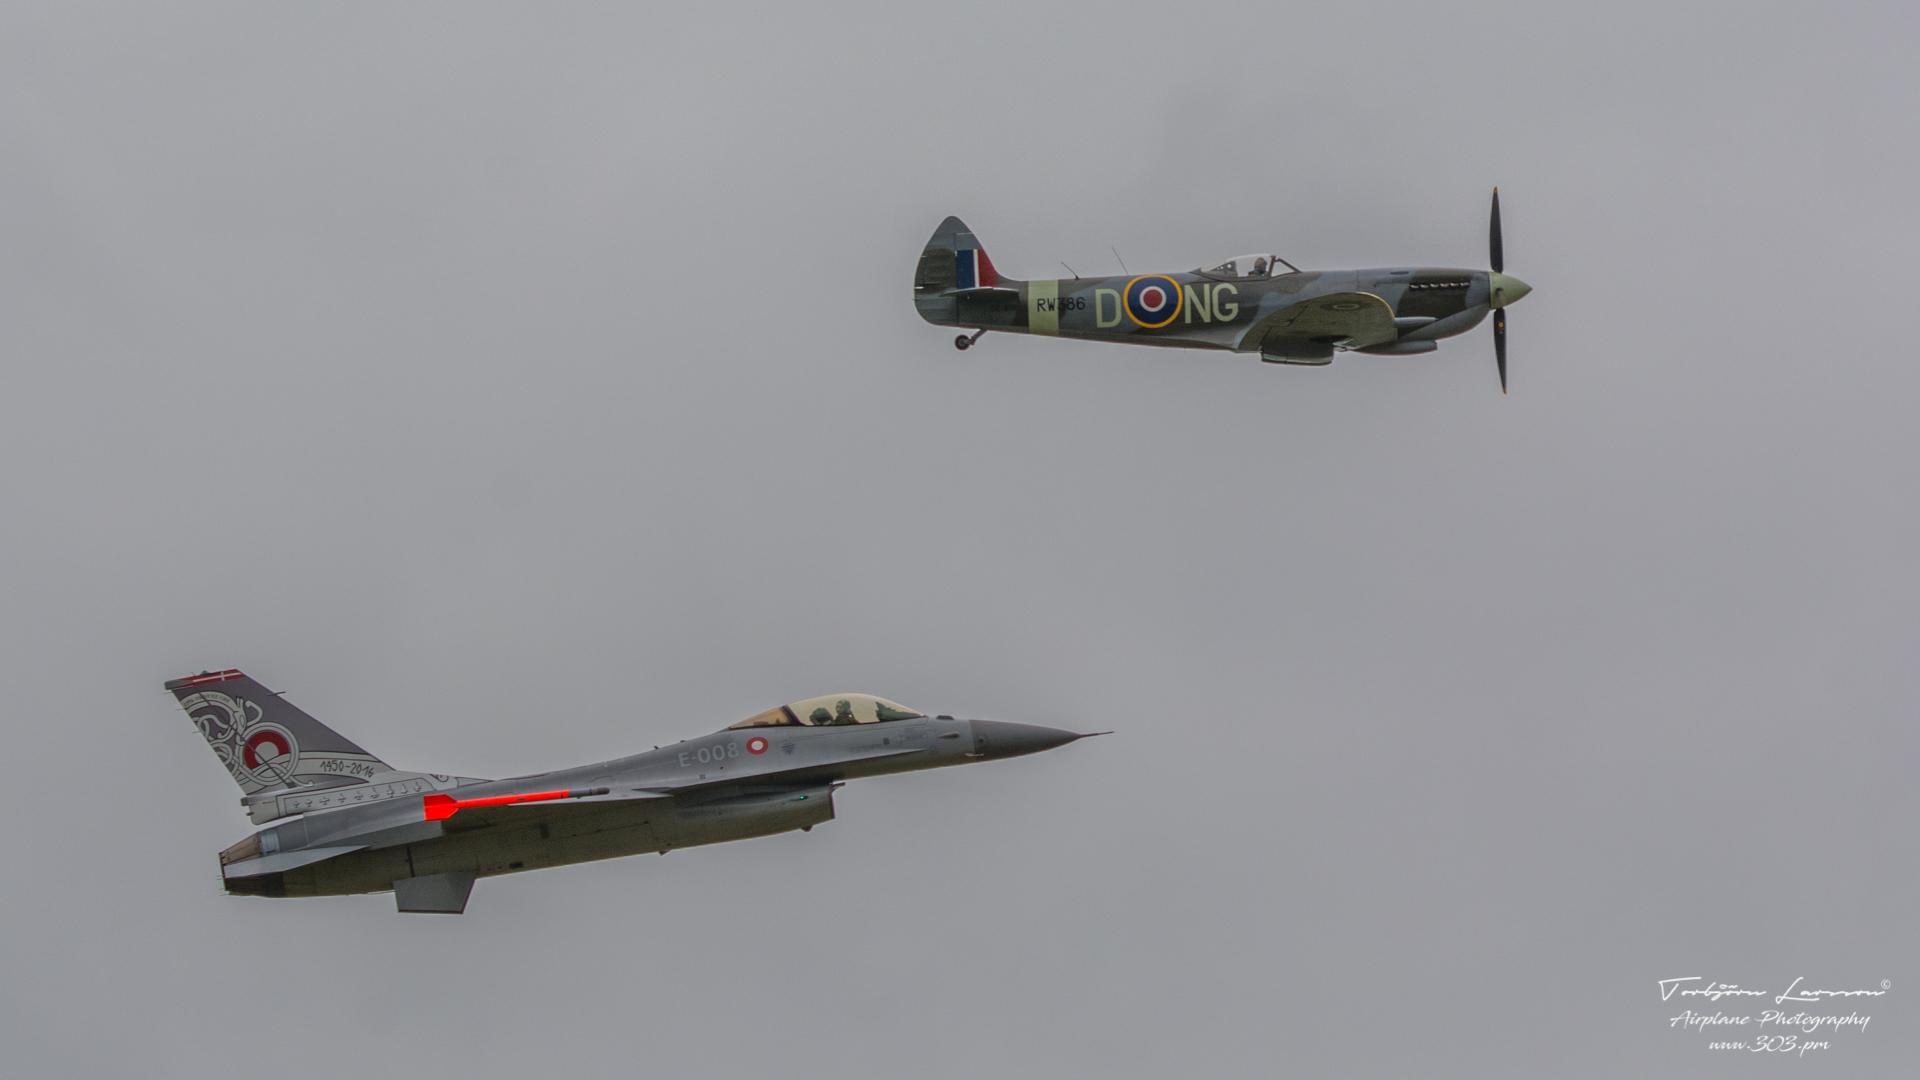 General Dynamics F-16 Fighting Falcon - Danish Air Force & Vickers Supermarine Spitfire Mk. XVI